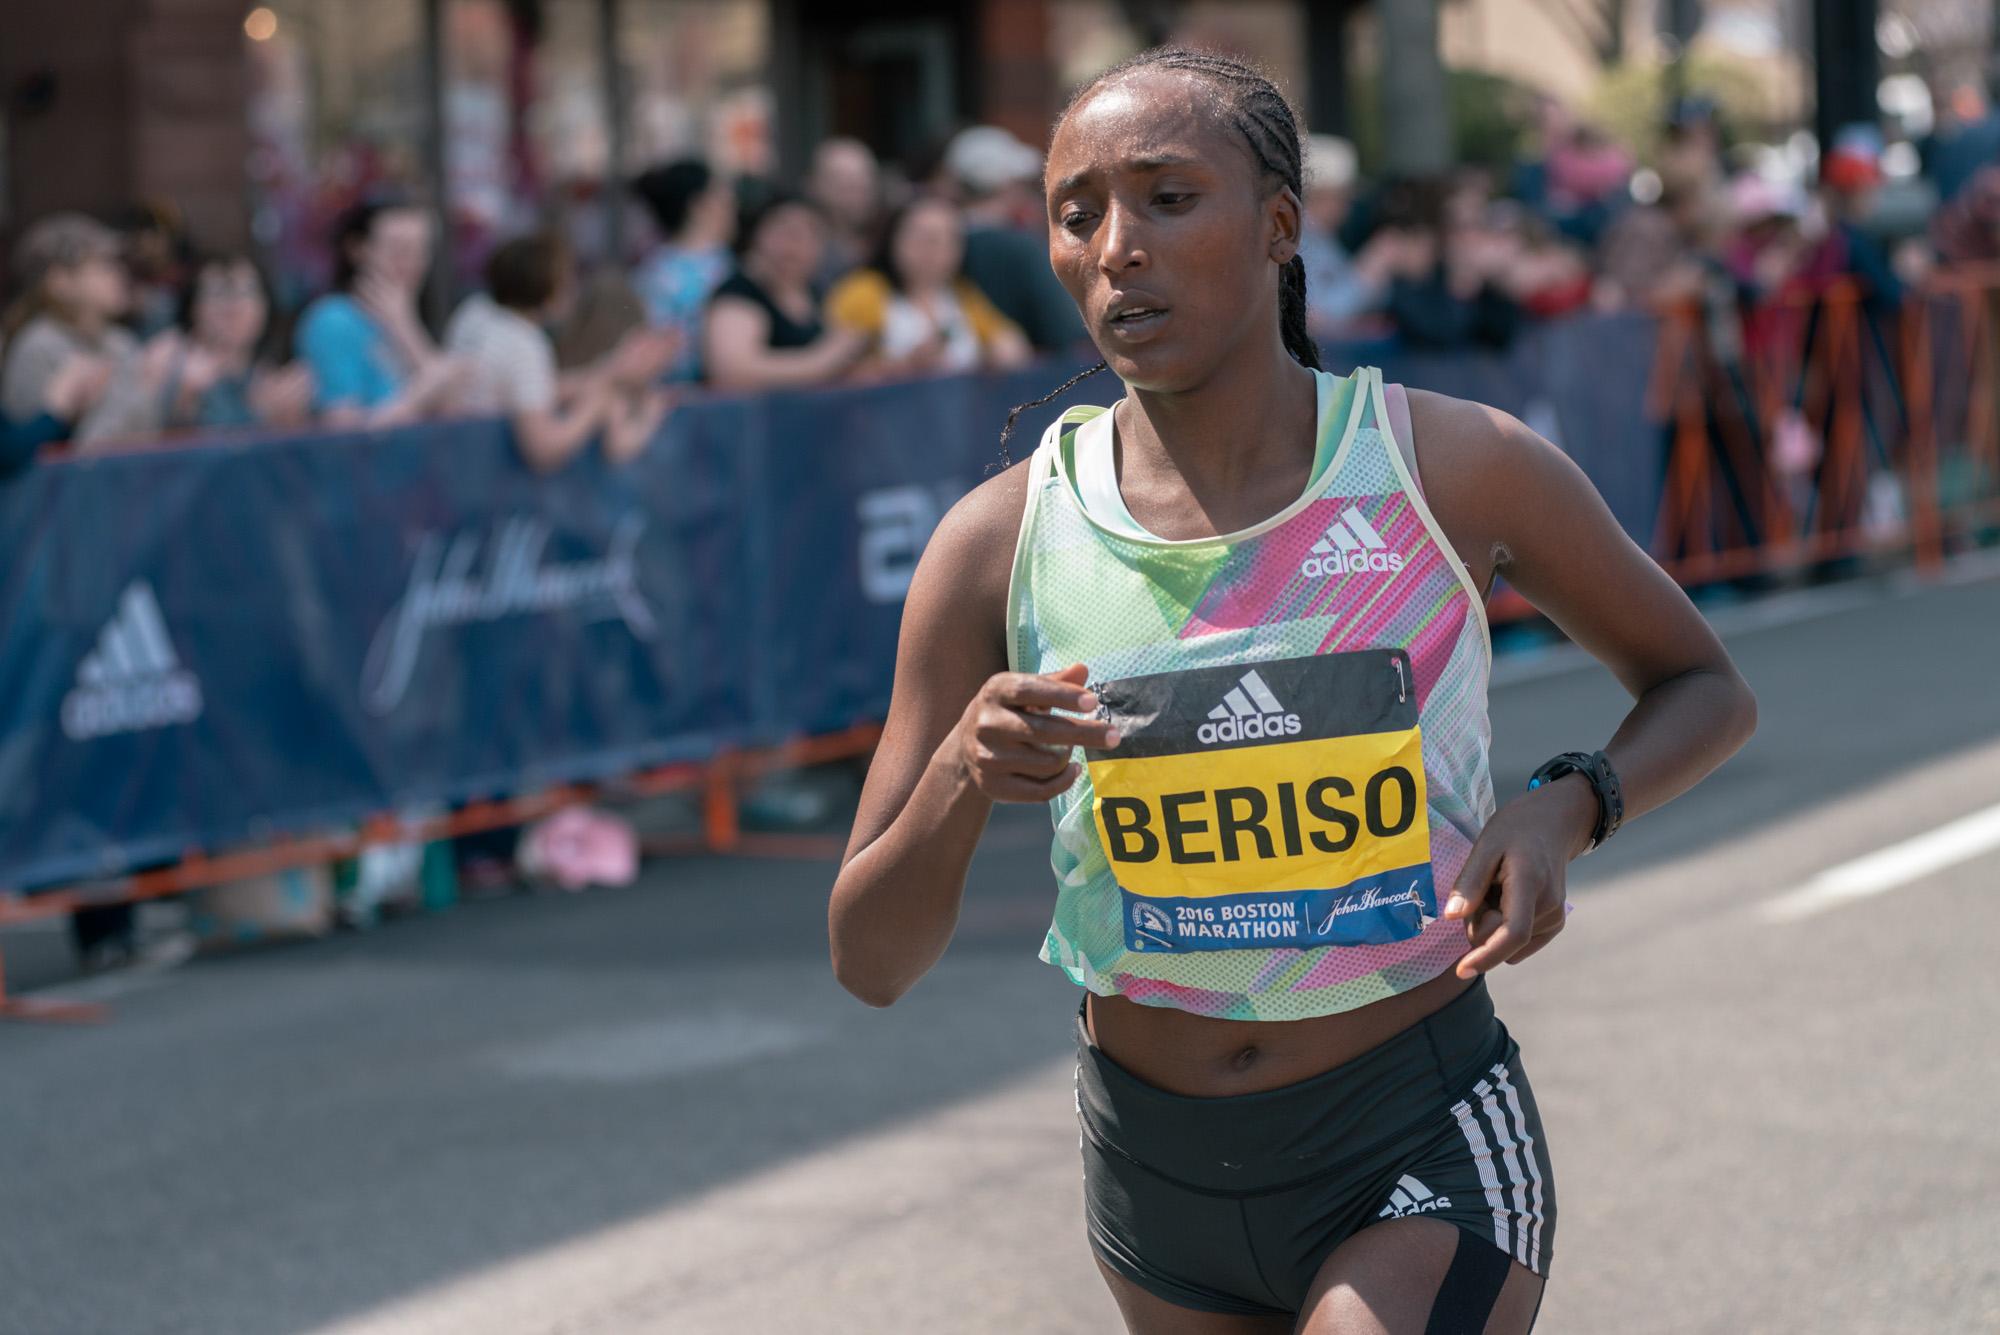 Amane Beriso -13th place